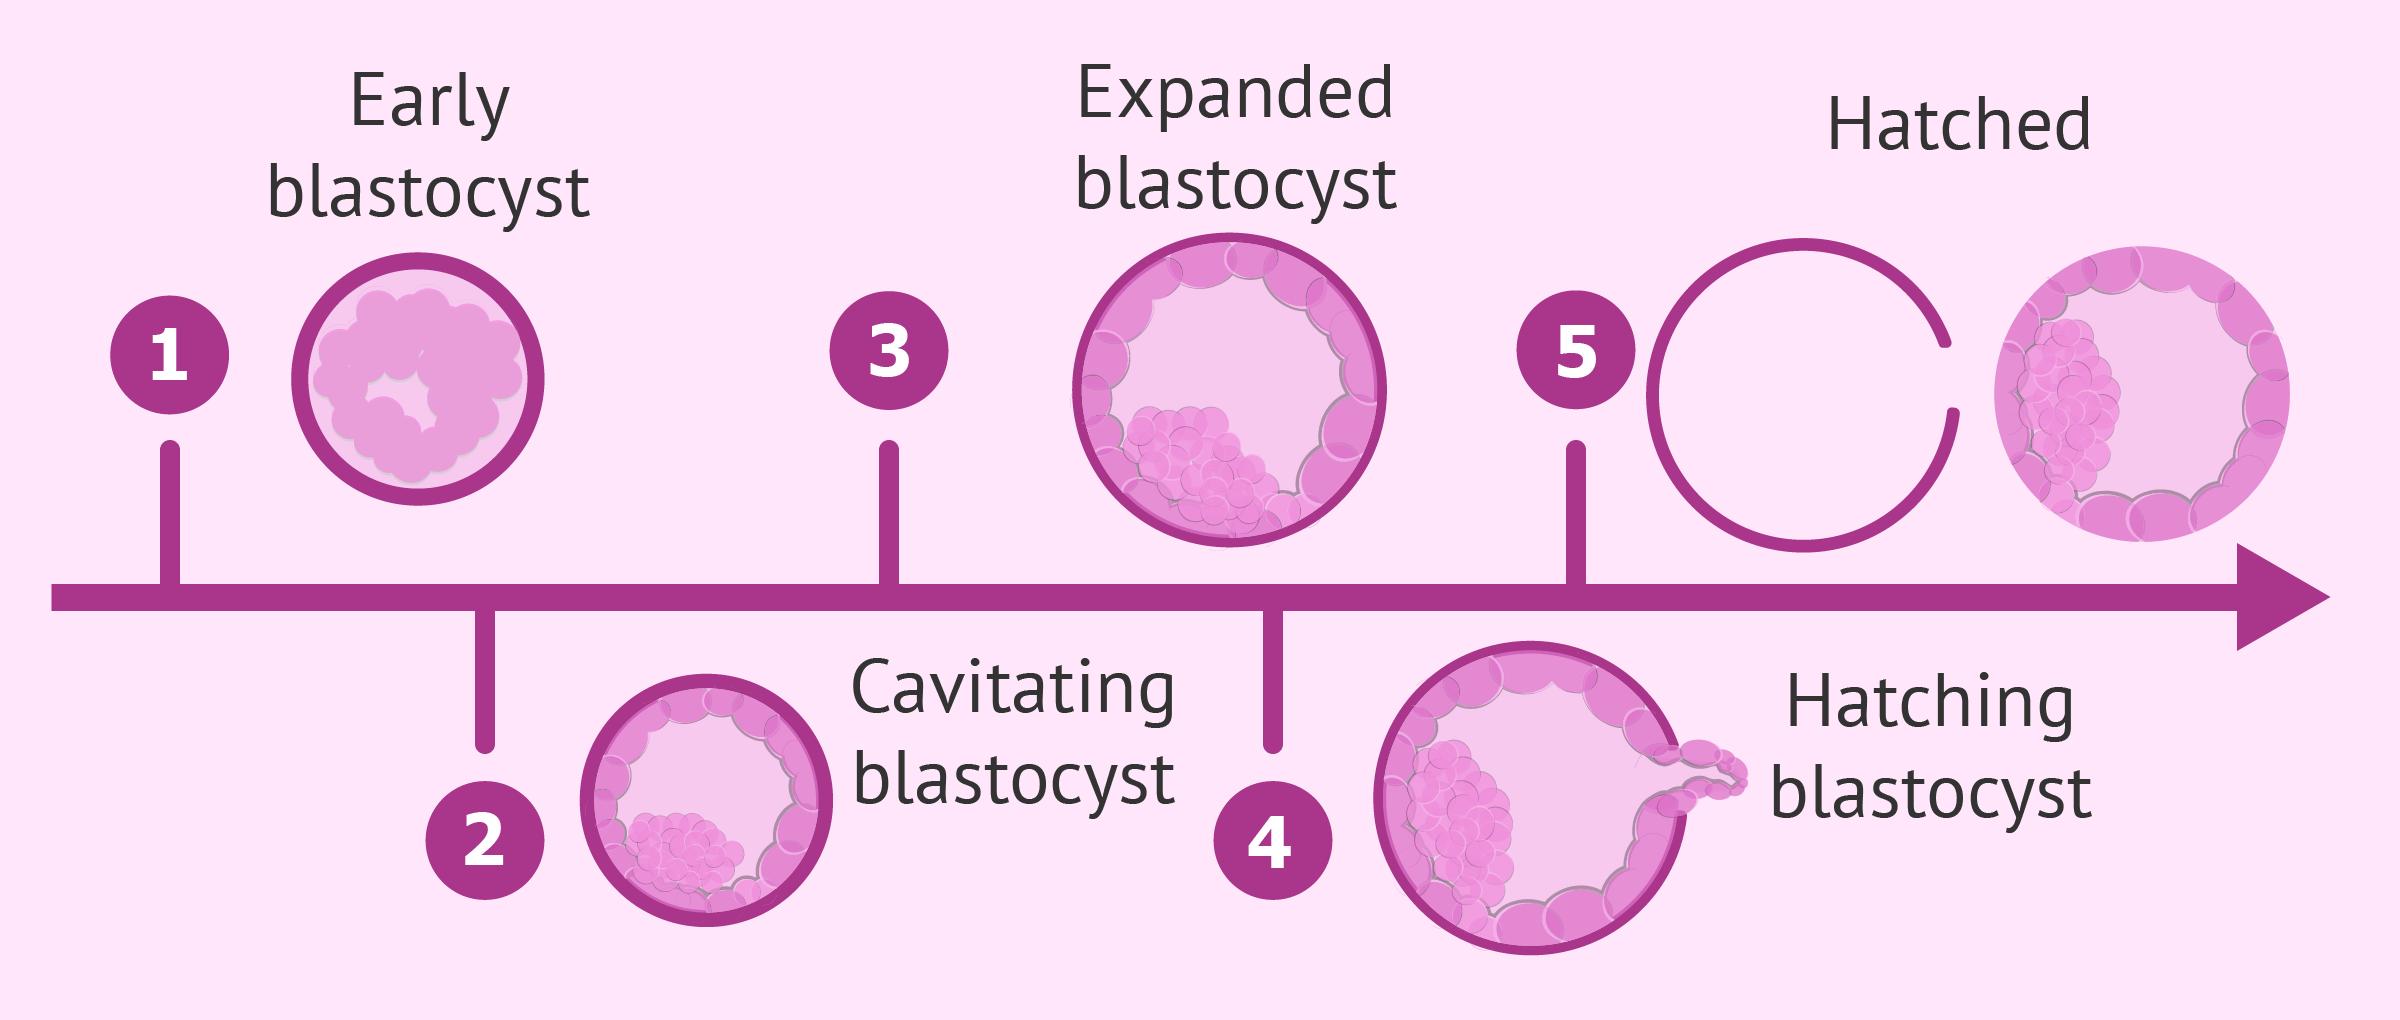 Blastocyst embryo development stages